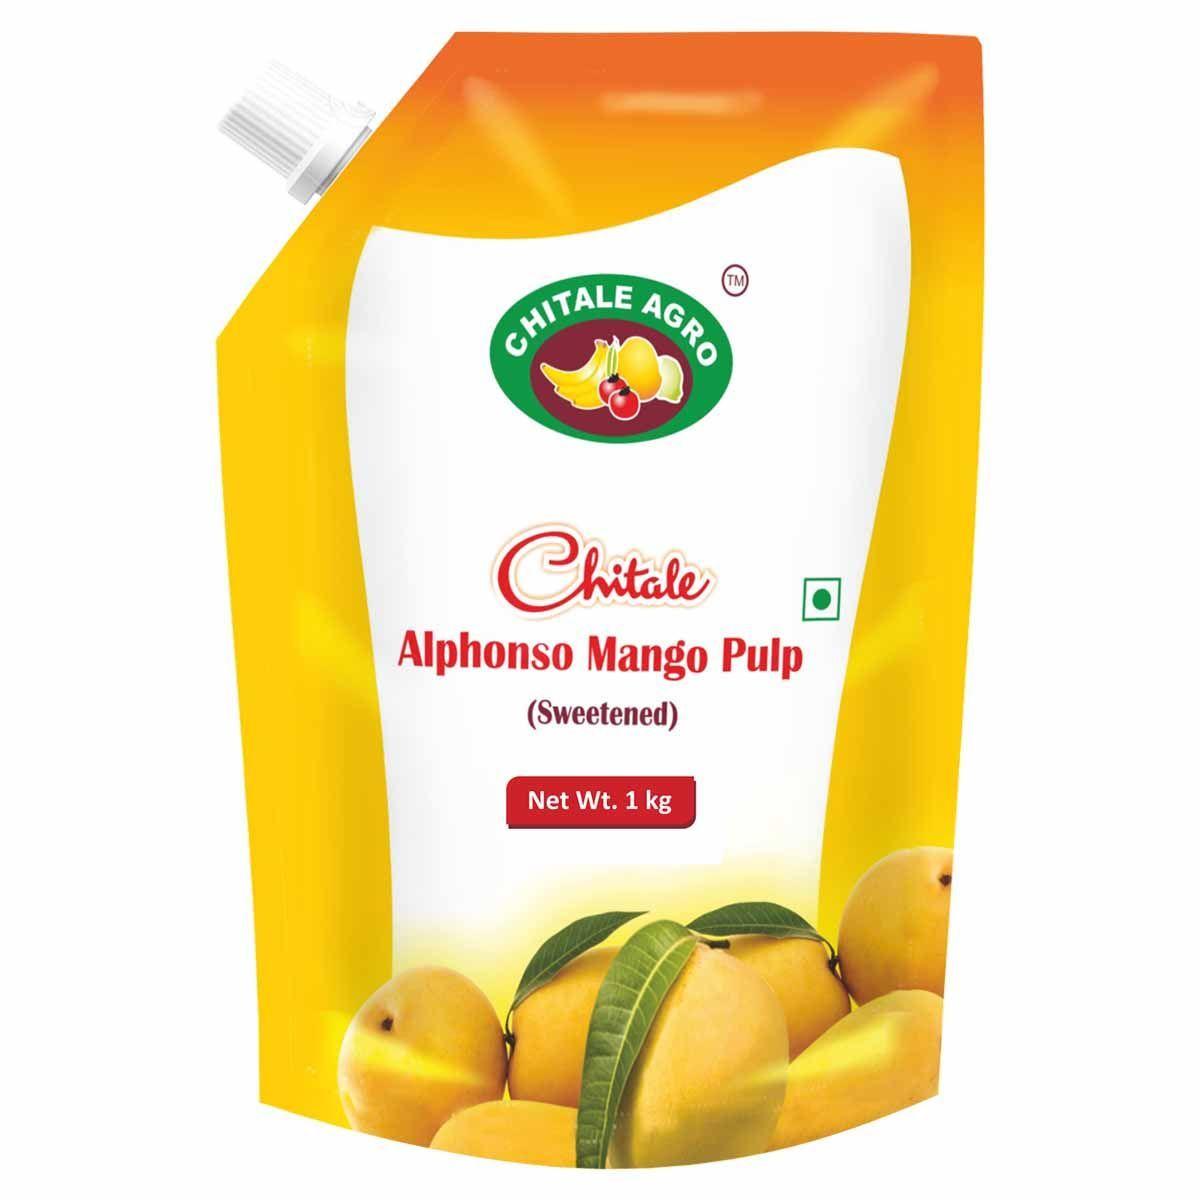 Alphnso Mango Pulp (Sweetened)